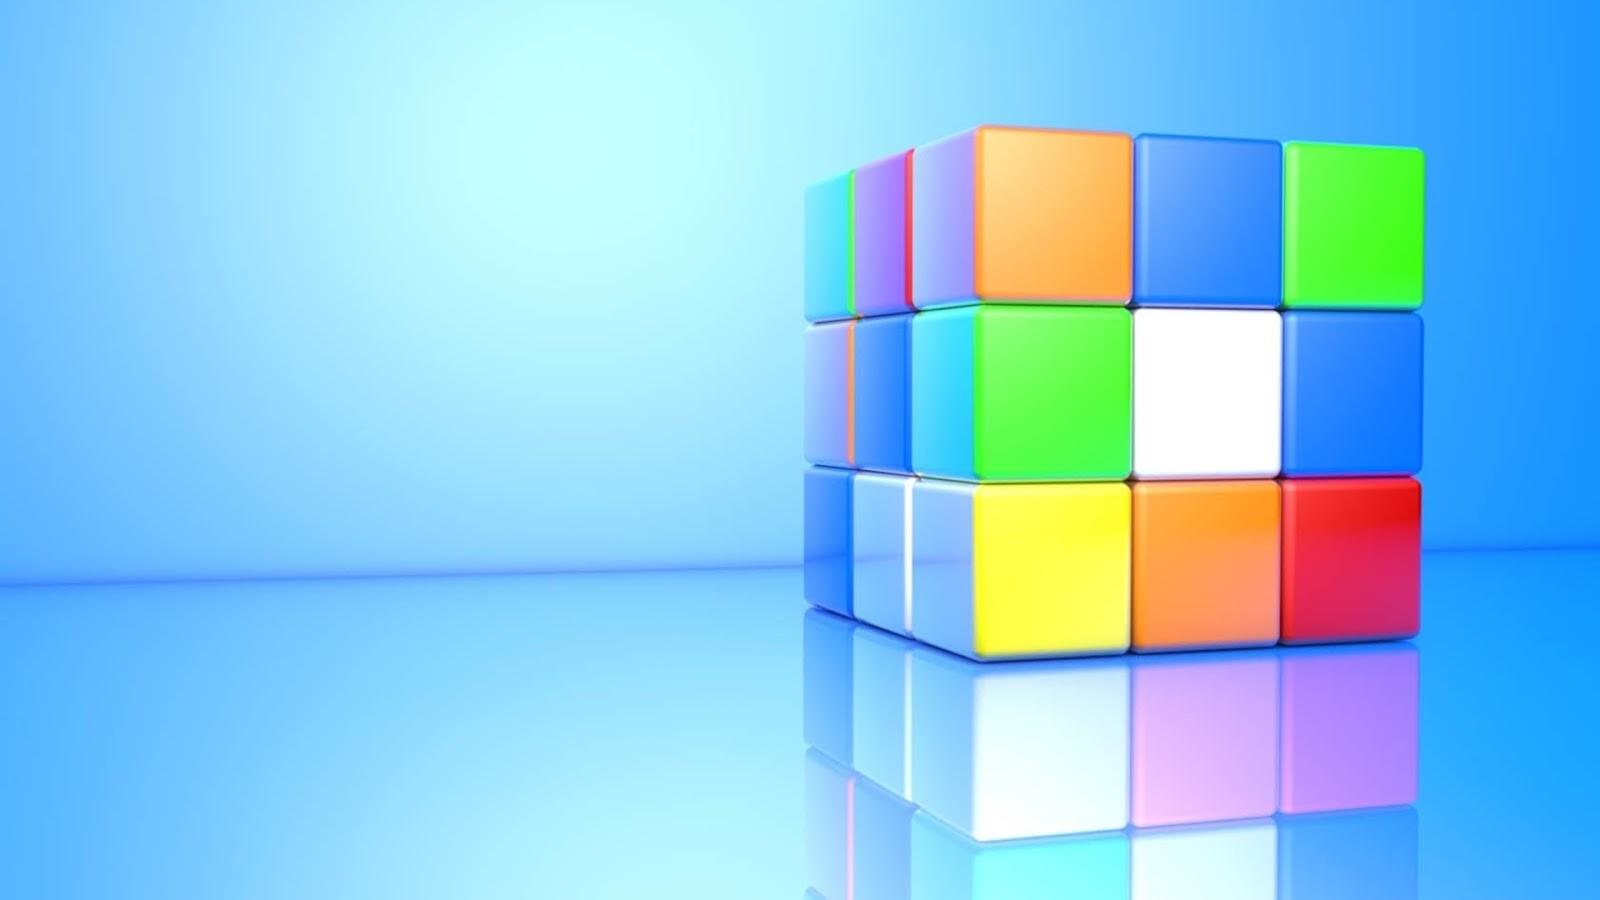 3D Rubiks Cube Mystery Wallpaper